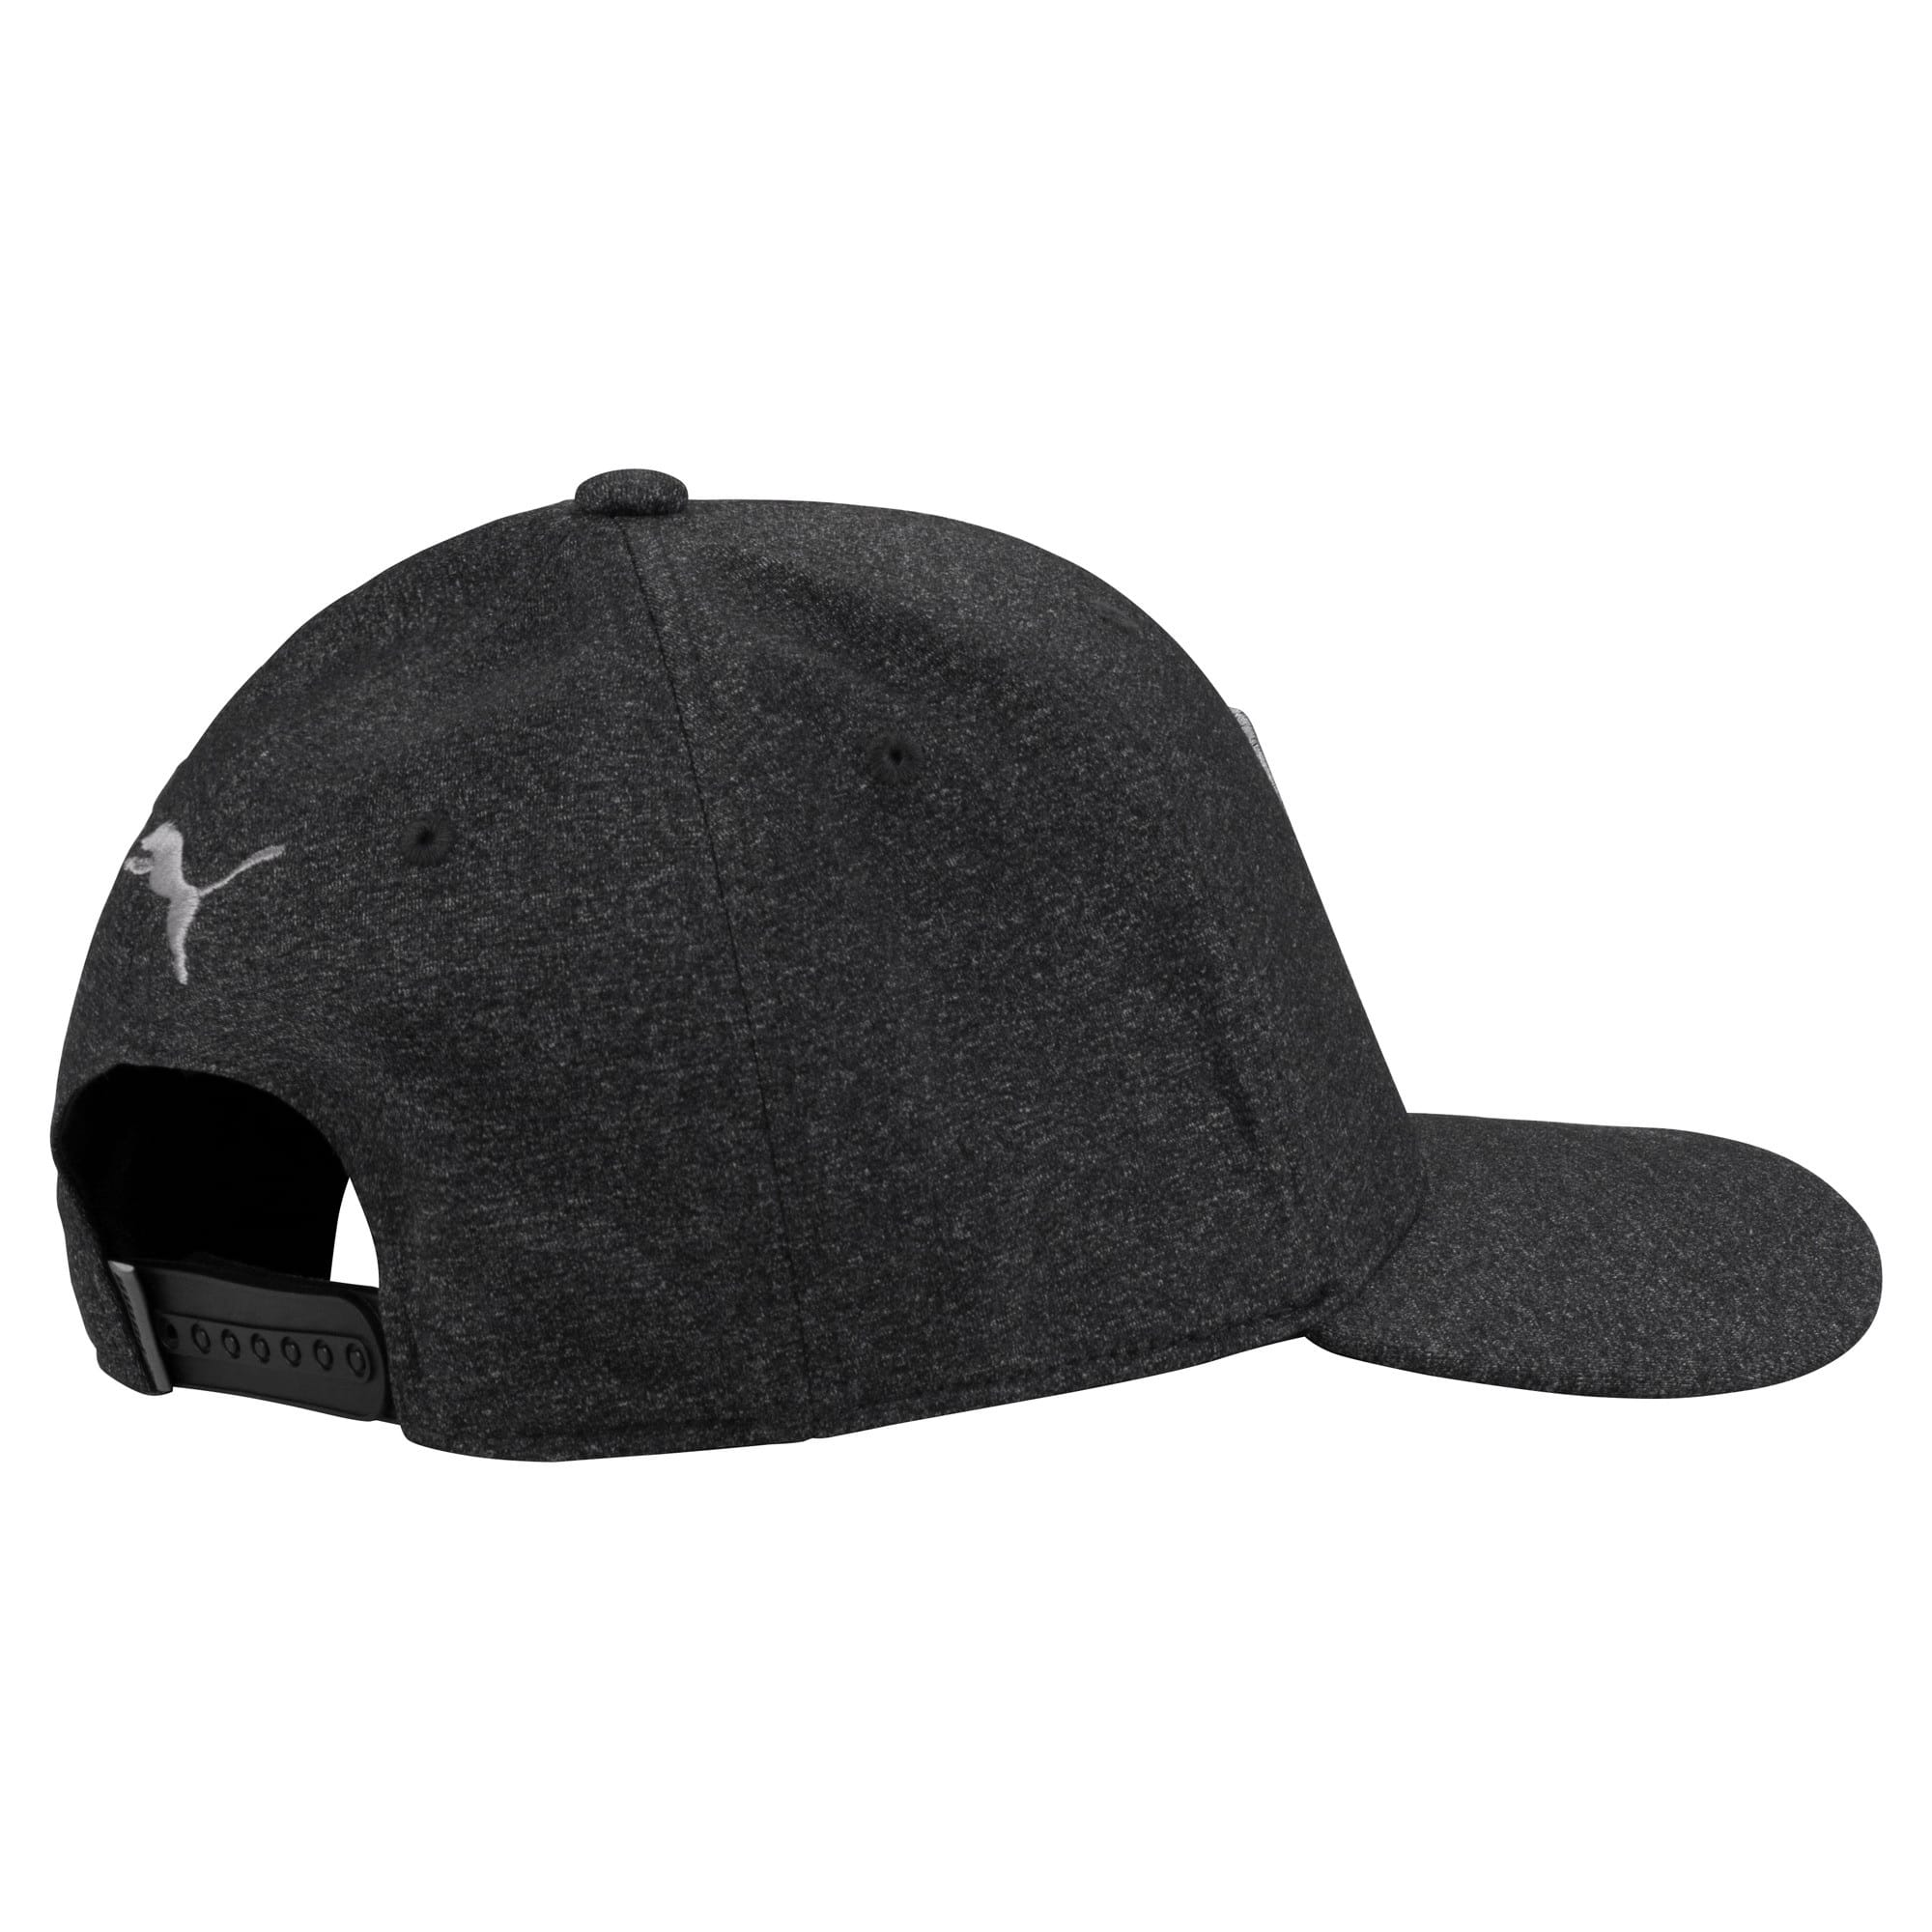 Thumbnail 2 of Golf Men's P Snapback Cap, Puma Black Heather, medium